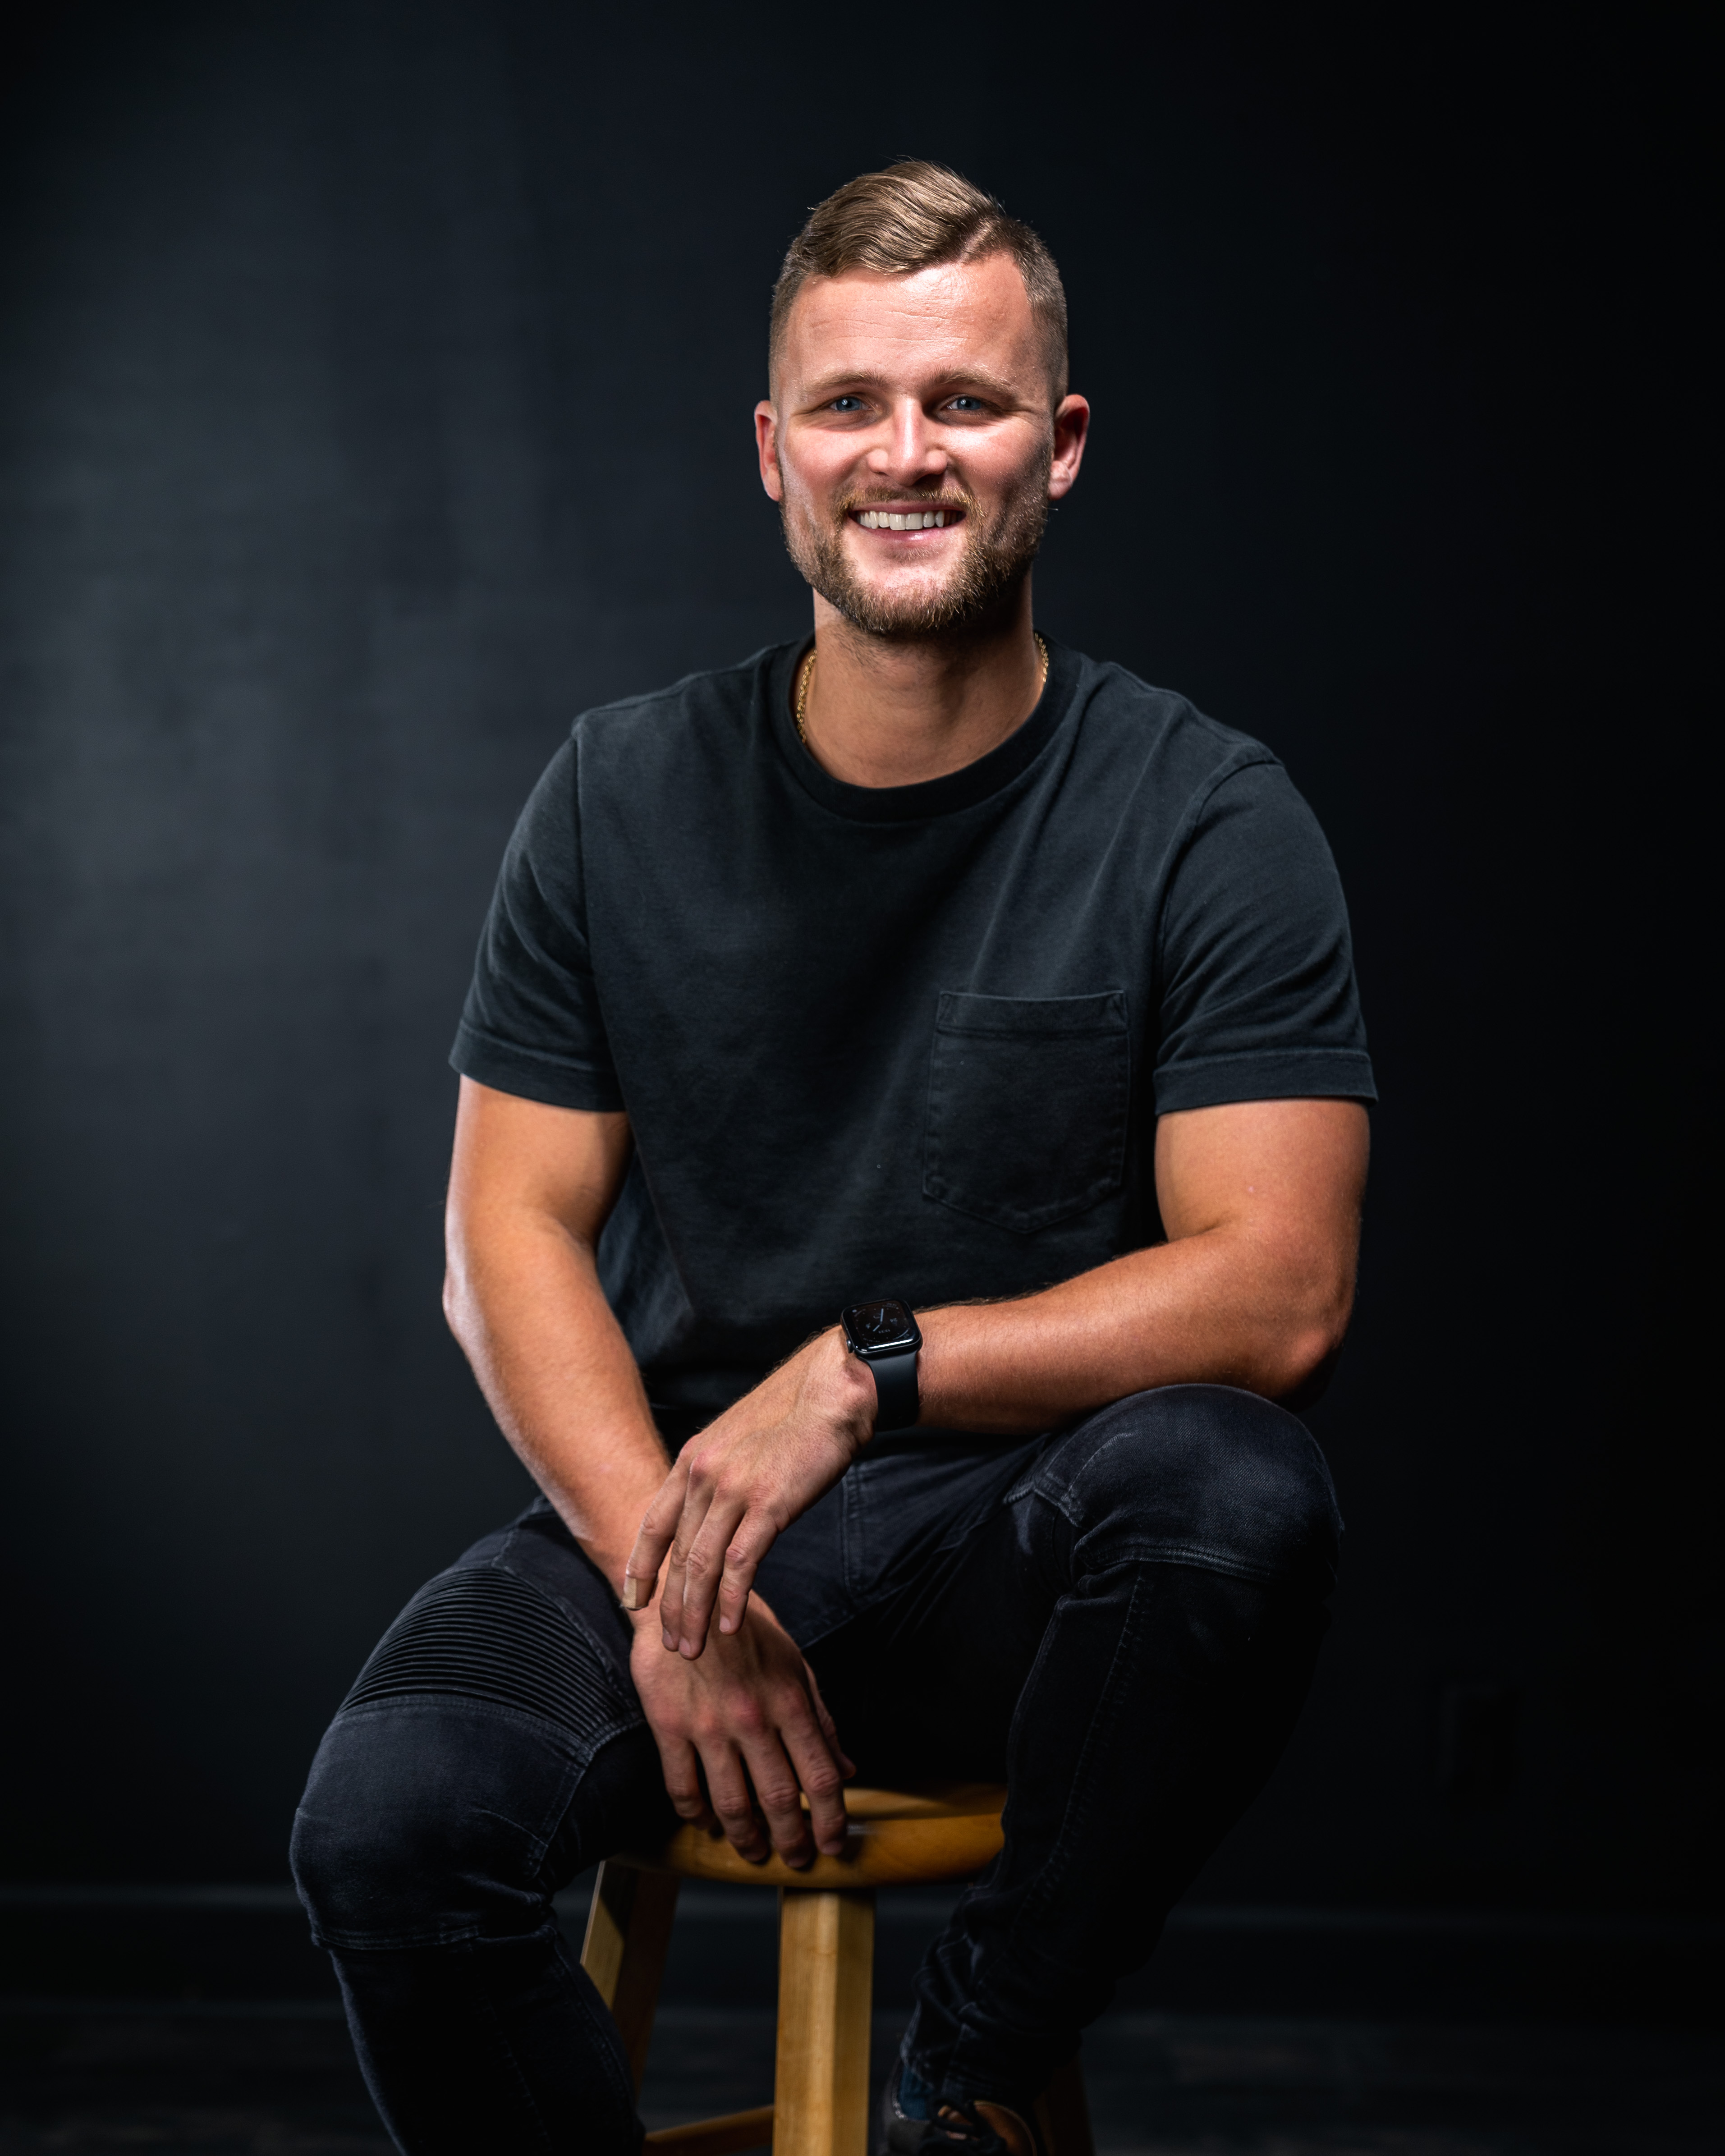 Tristan Gardner